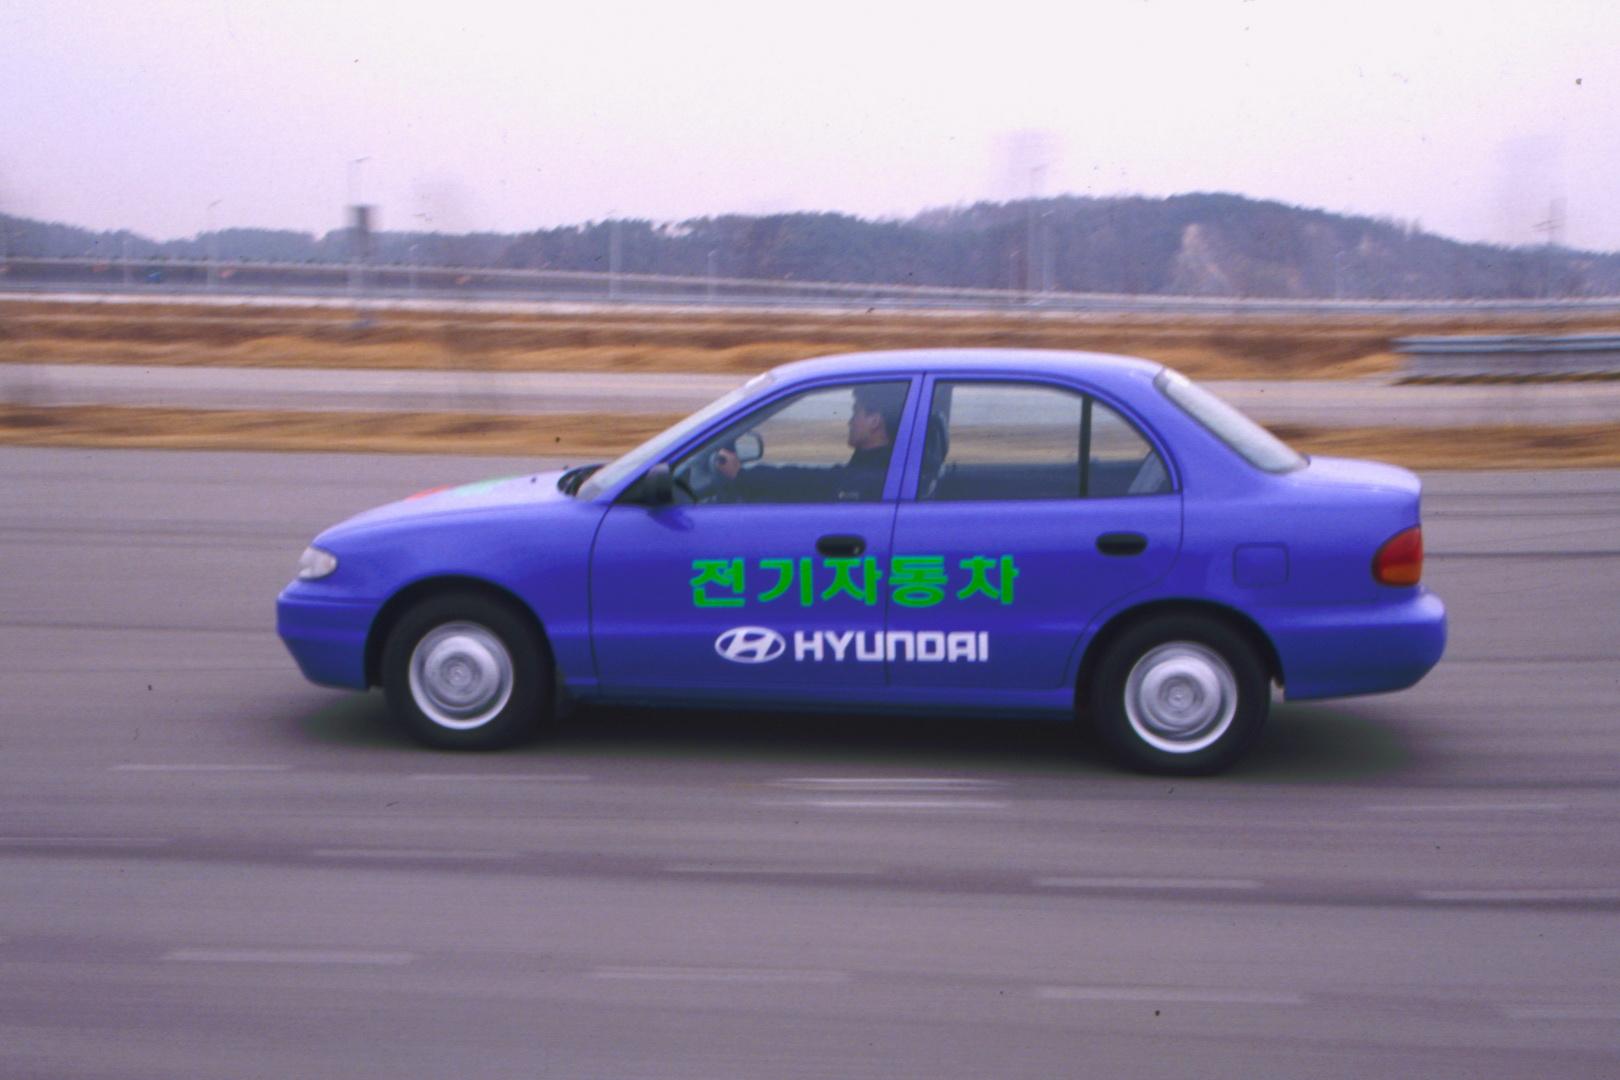 Hyundai Accent EV